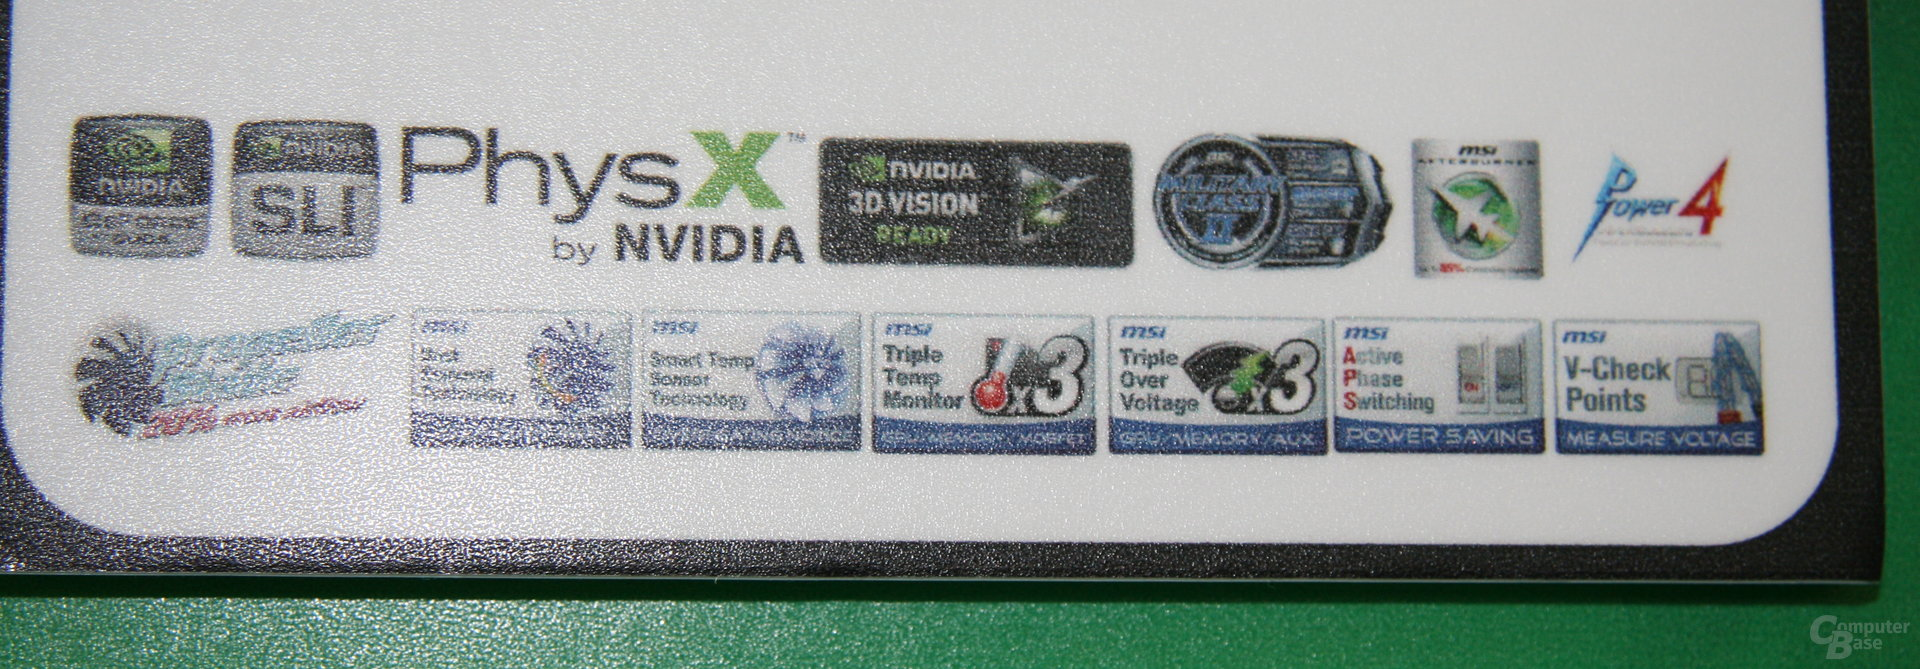 MSI GTX 580 Lightning Xtreme Edition